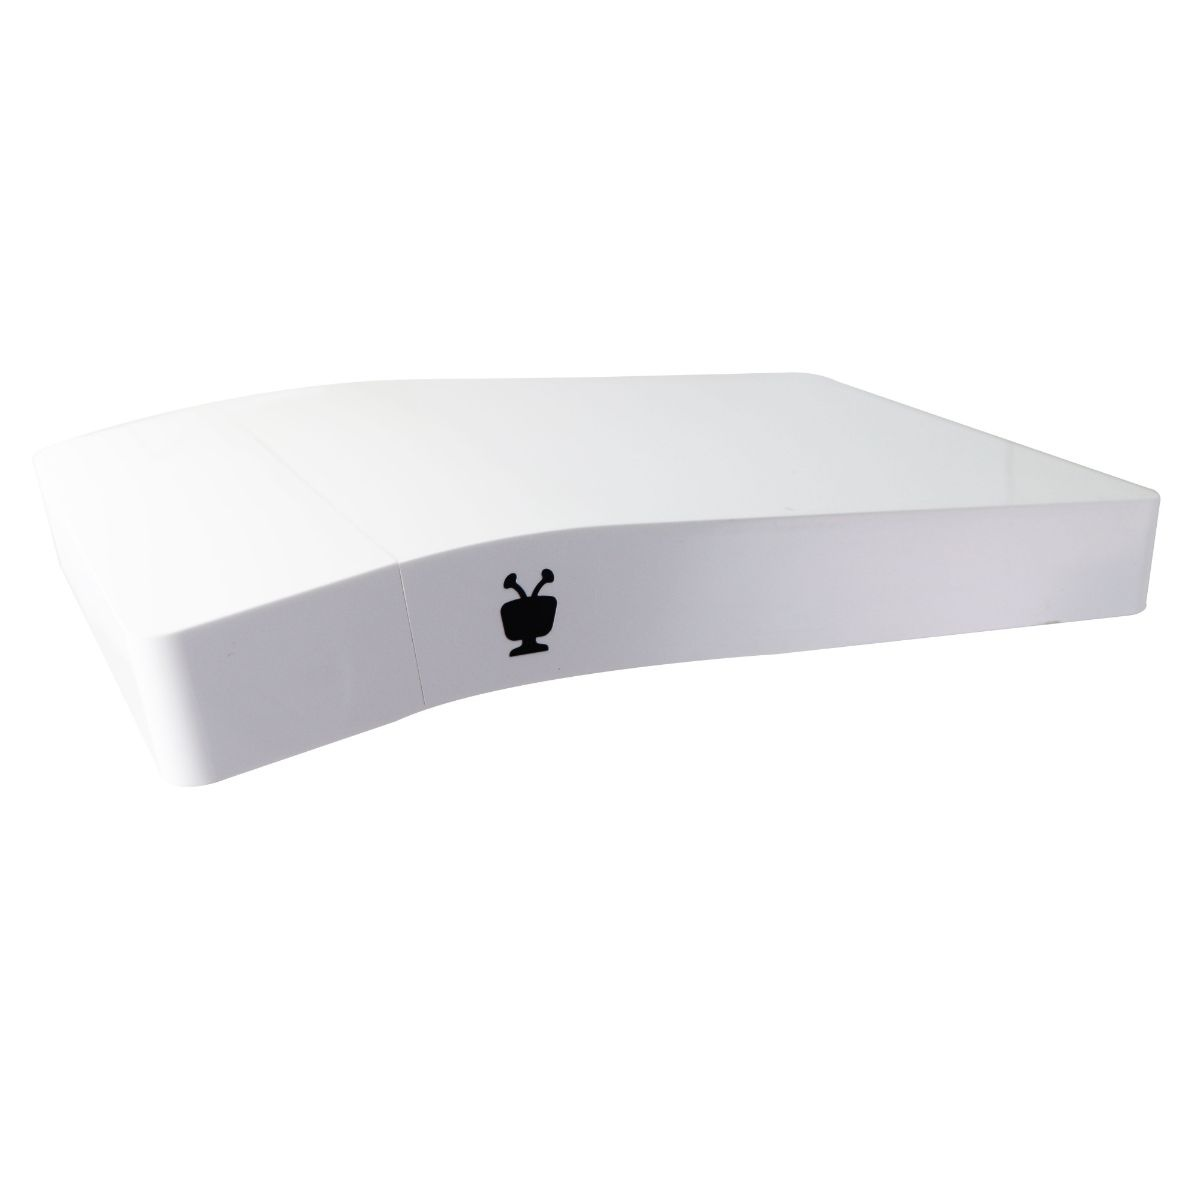 TiVo Bolt 1000 GB DVR and Streaming Media Player (TCD849000) - White